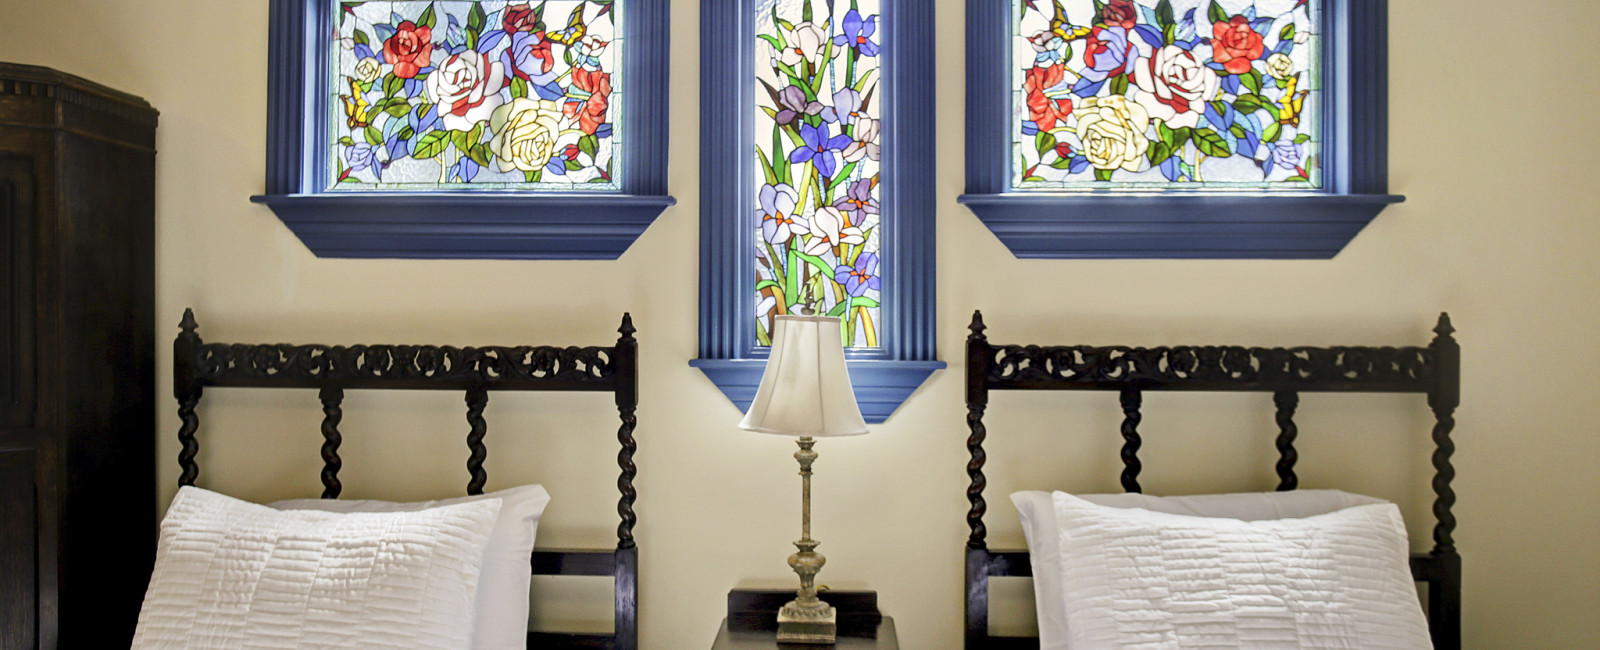 sara s inn bed and breakfast houston houston texas